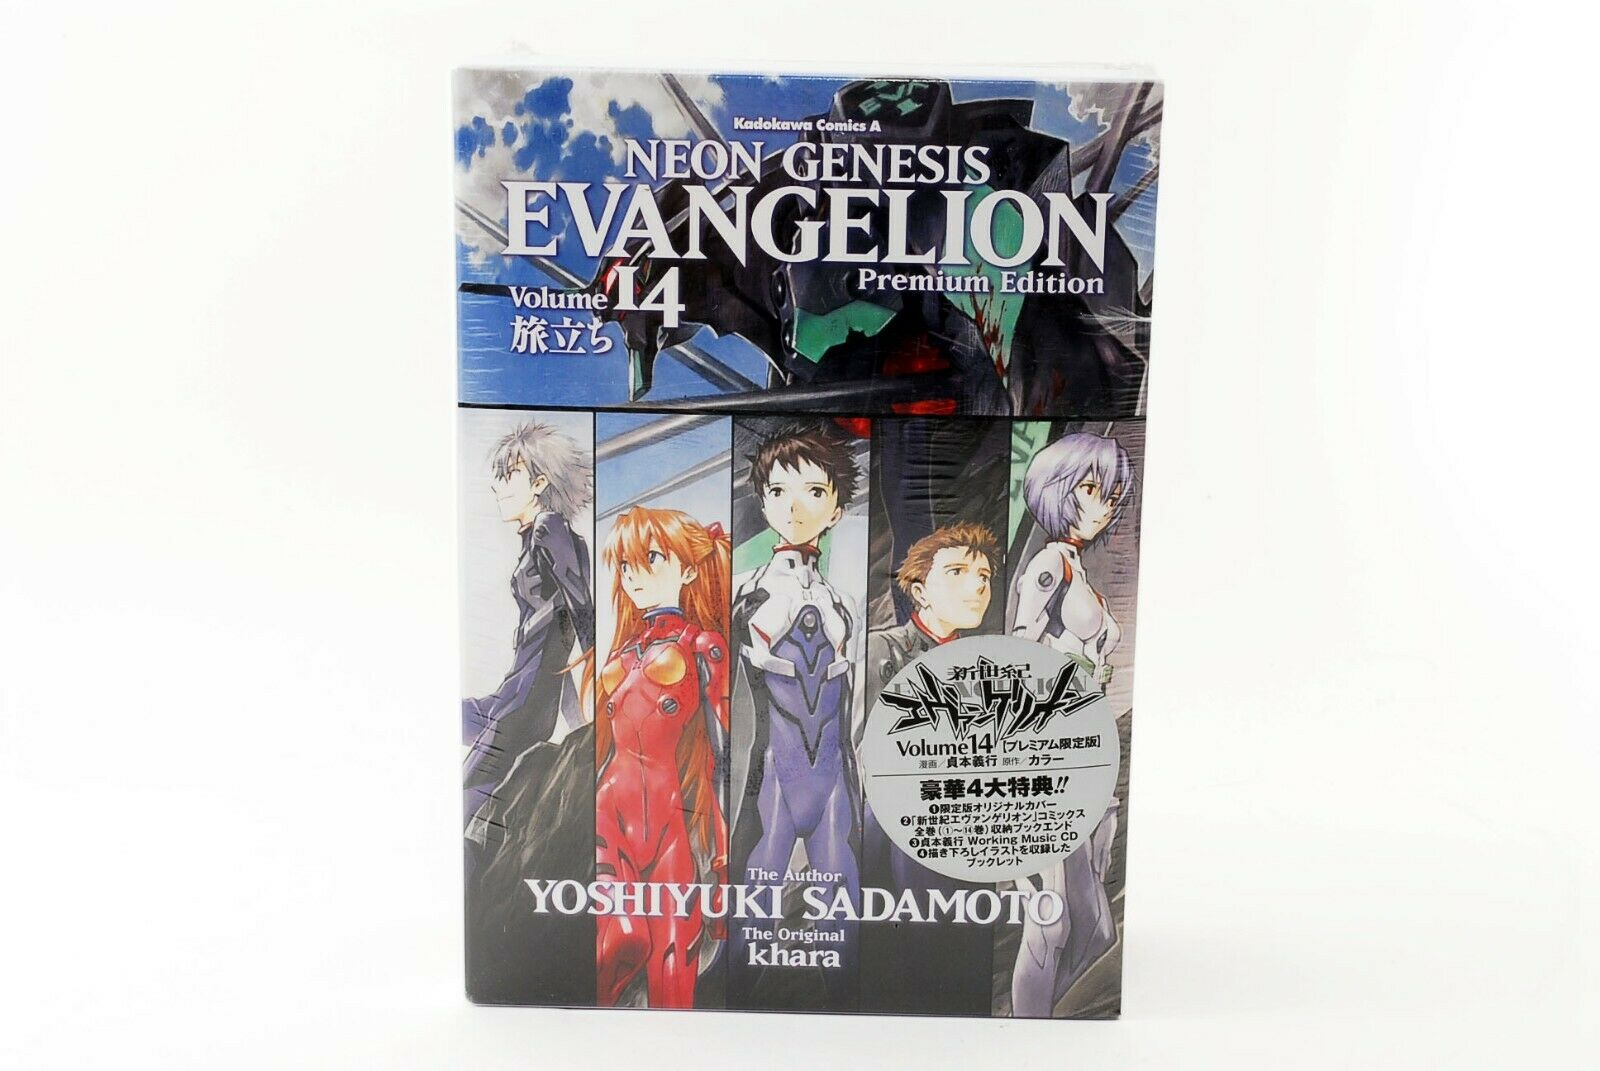 Neon Genesis Evangelion, Vol. 14 (Premium Limitierte Auflage) (Kadokawa Comic A)